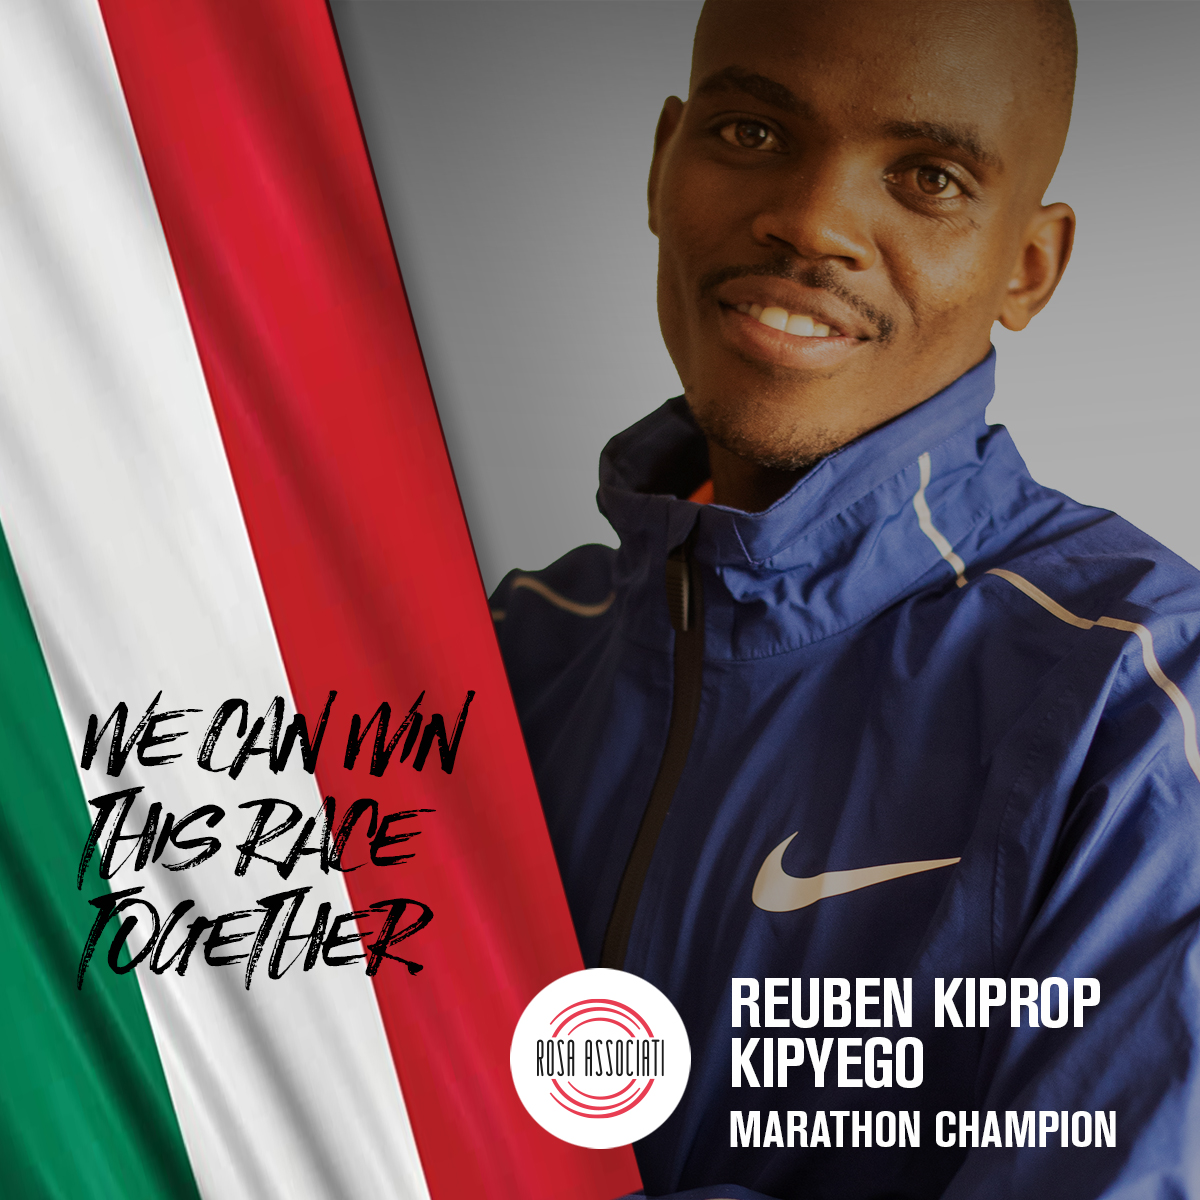 21 2020 - Campagna social We can win this race together-Reuben Kiprop Kipyego